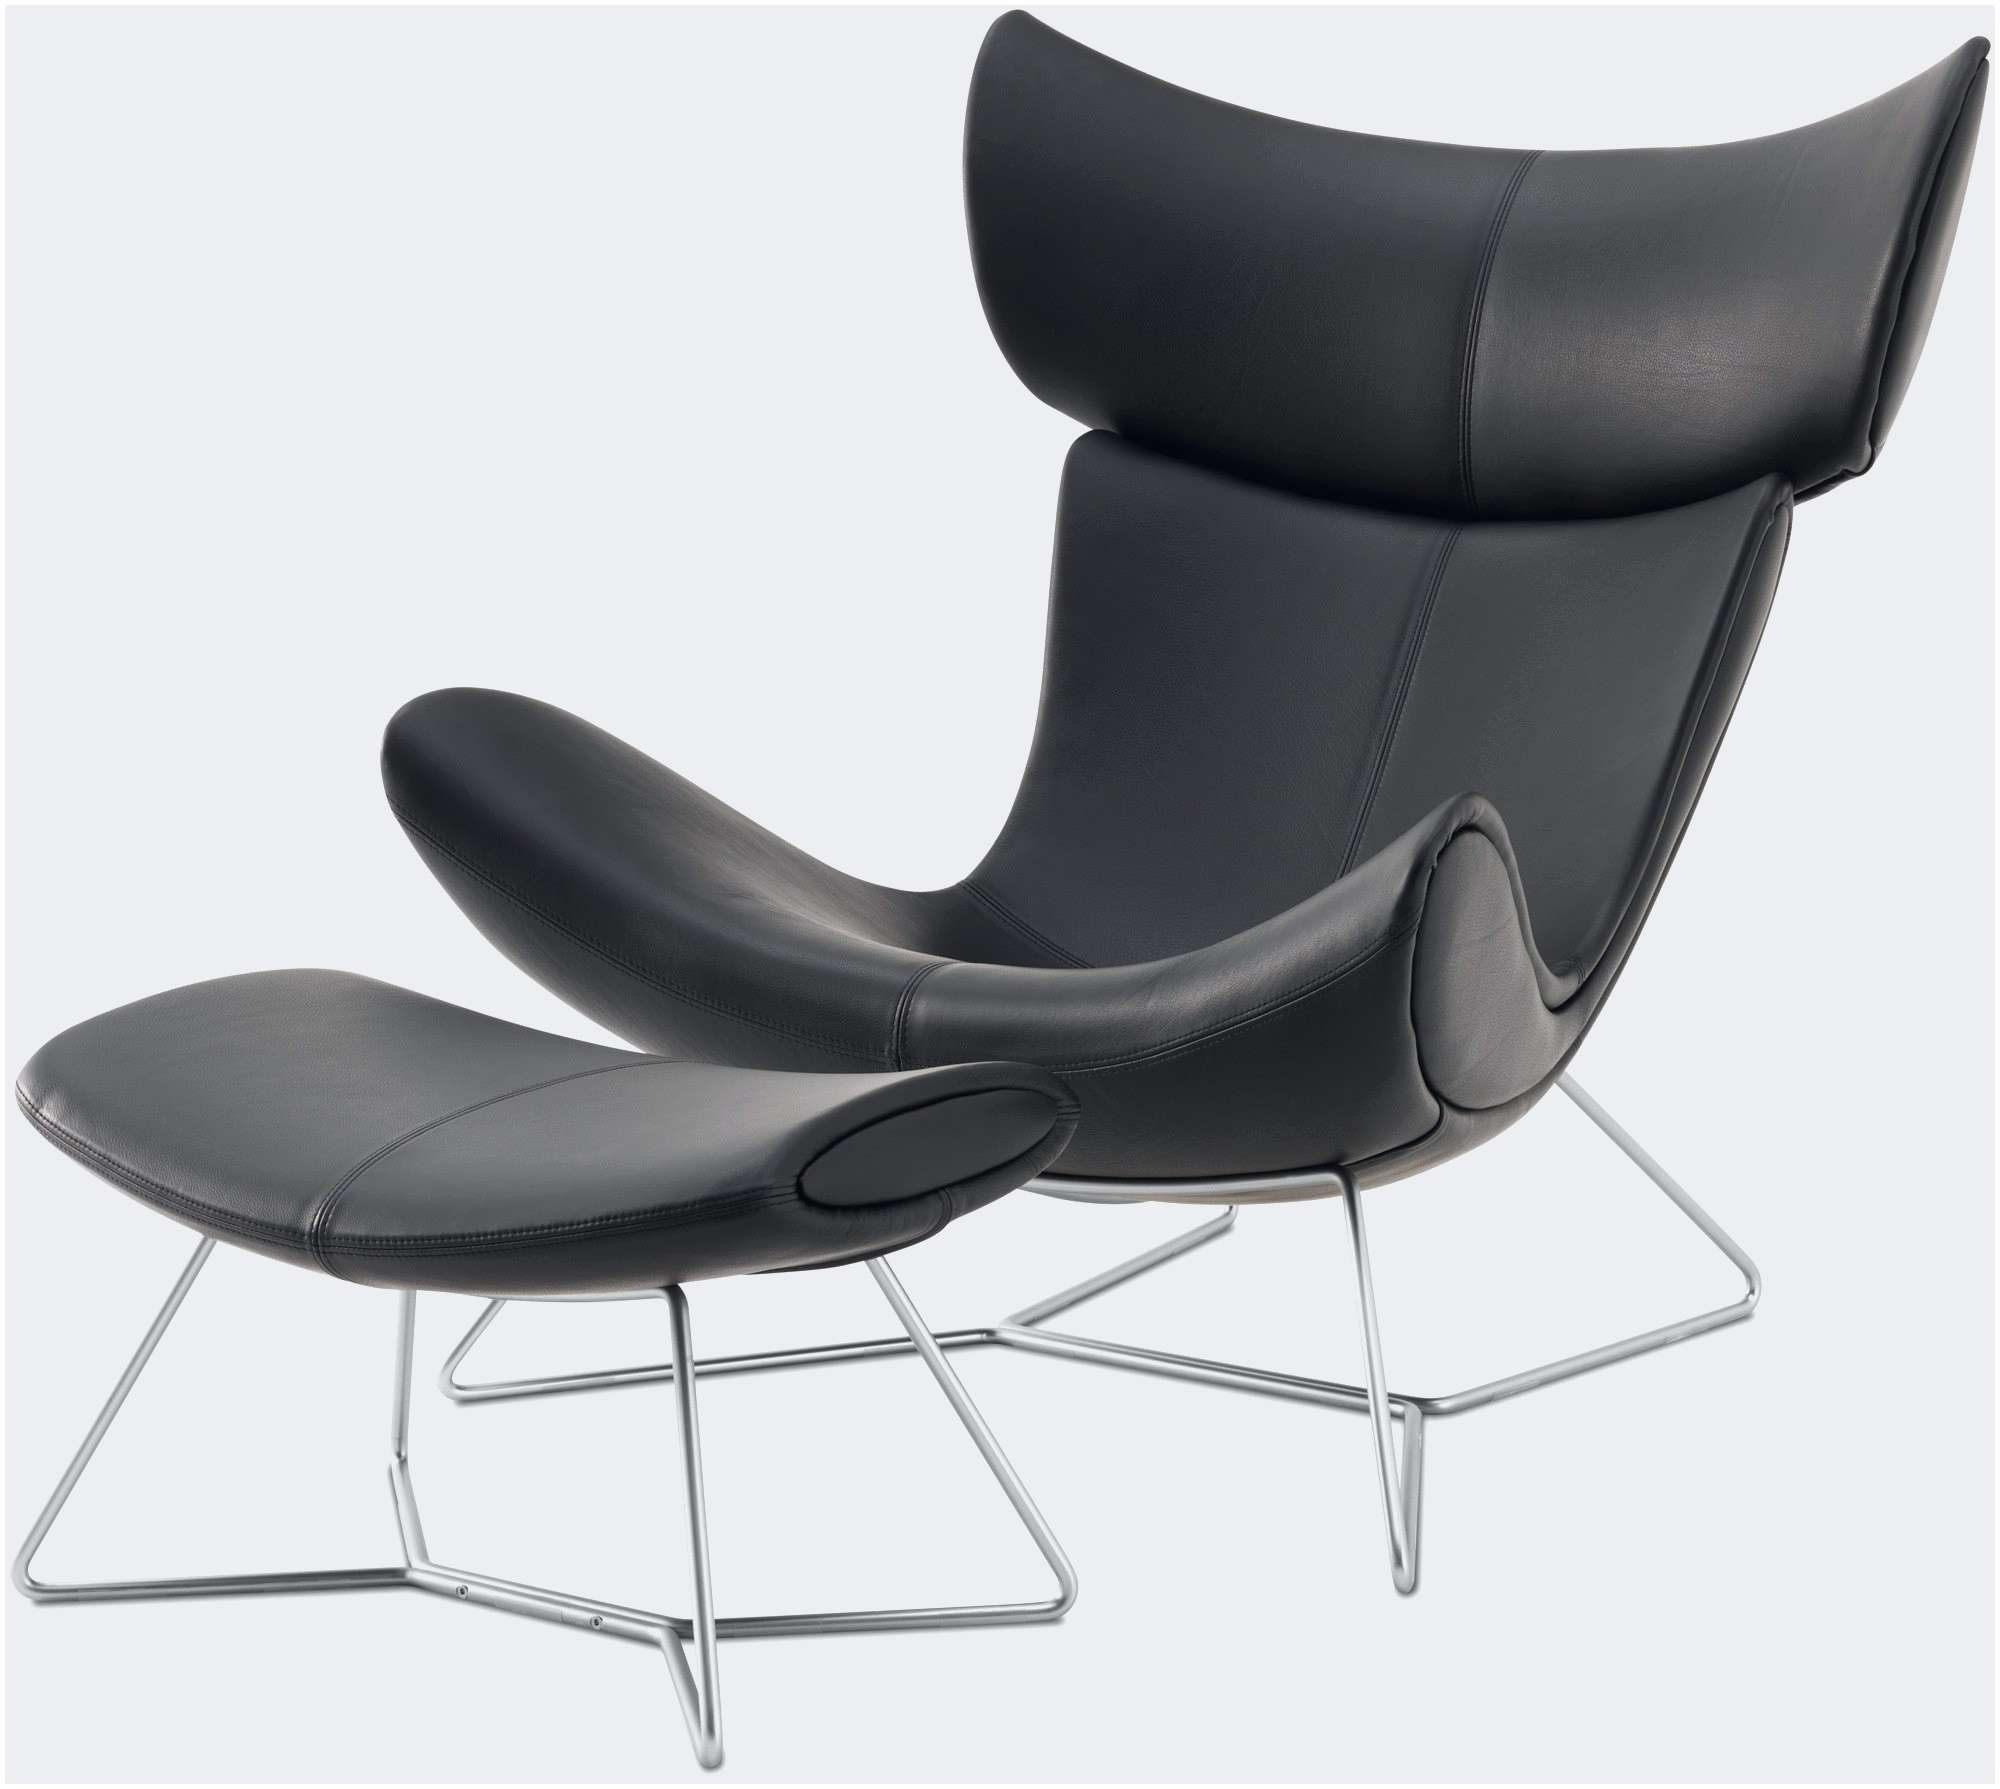 Menzzo Tete De Lit Inspiré 68 Menzzo Chaise Scandinave Concept Jongor4hire